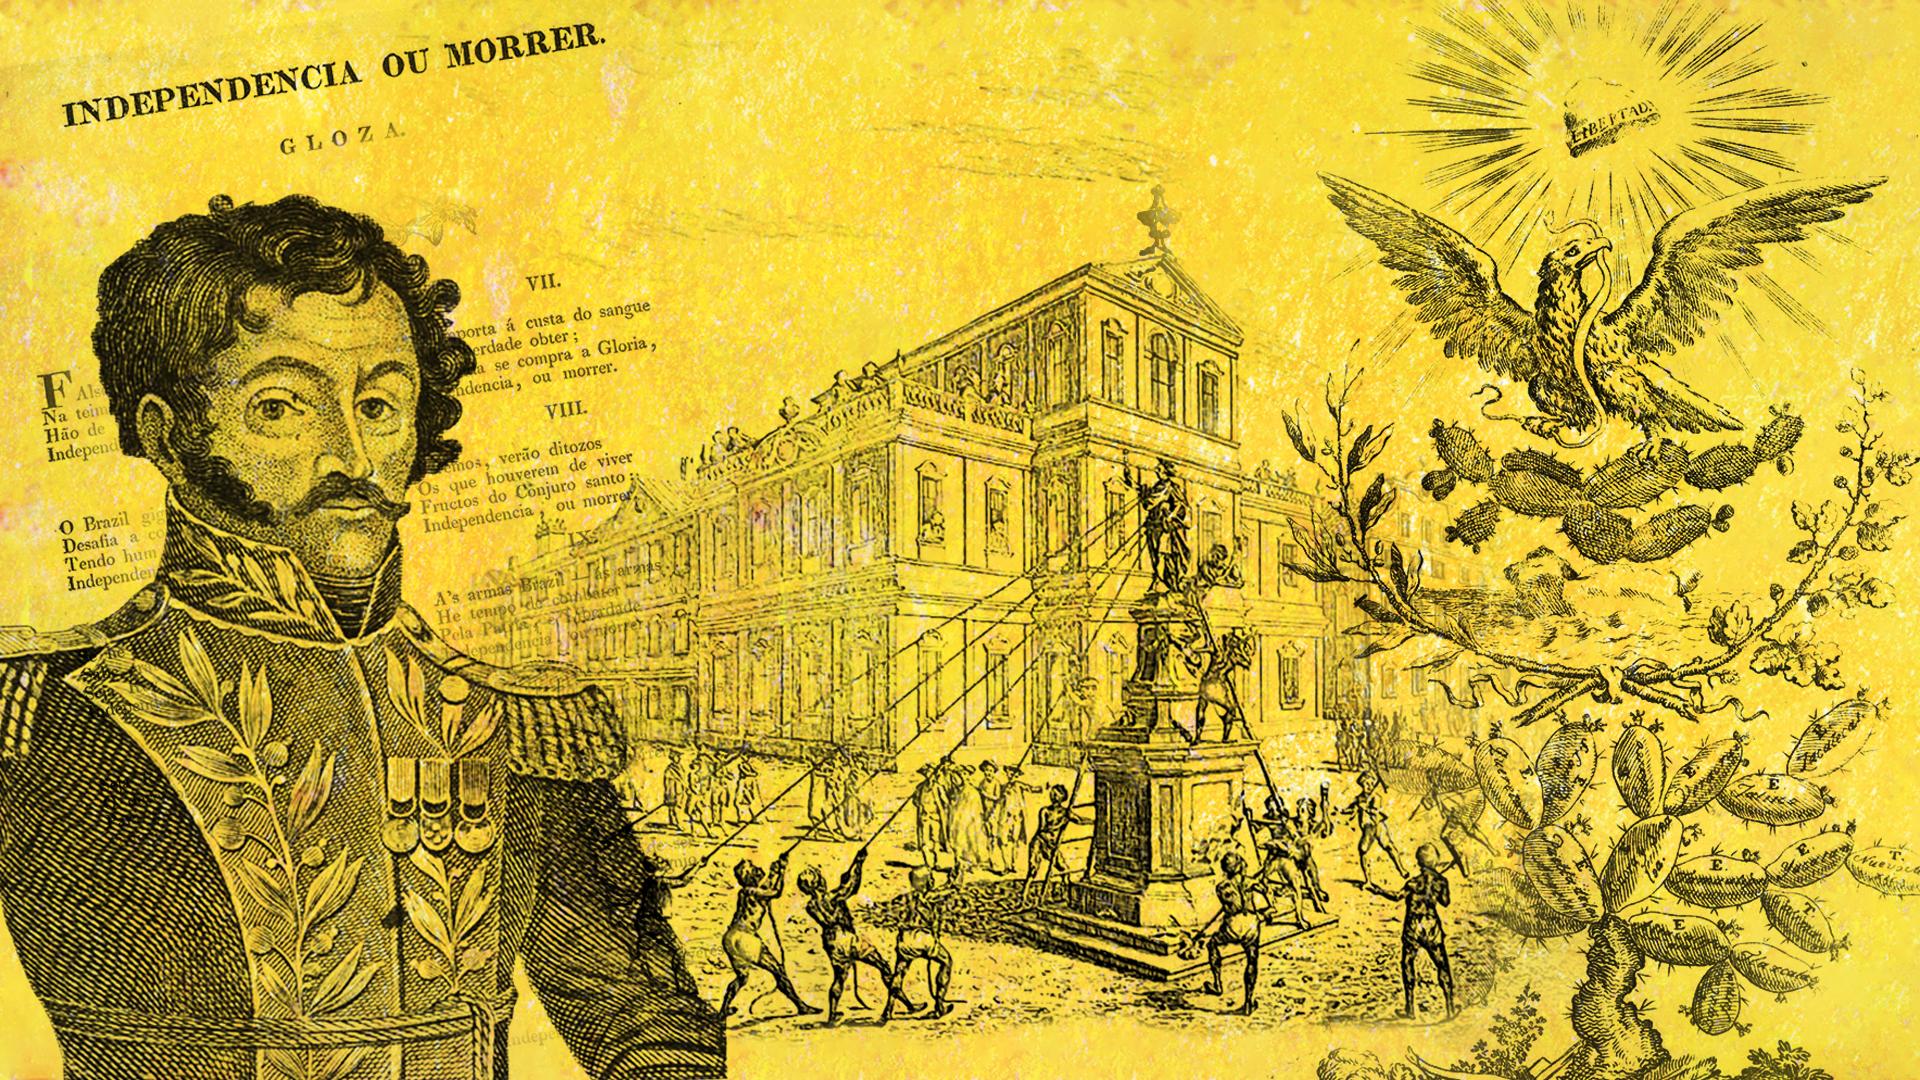 ¡Viva la Libertad! Latin America and the Age of Revolutions